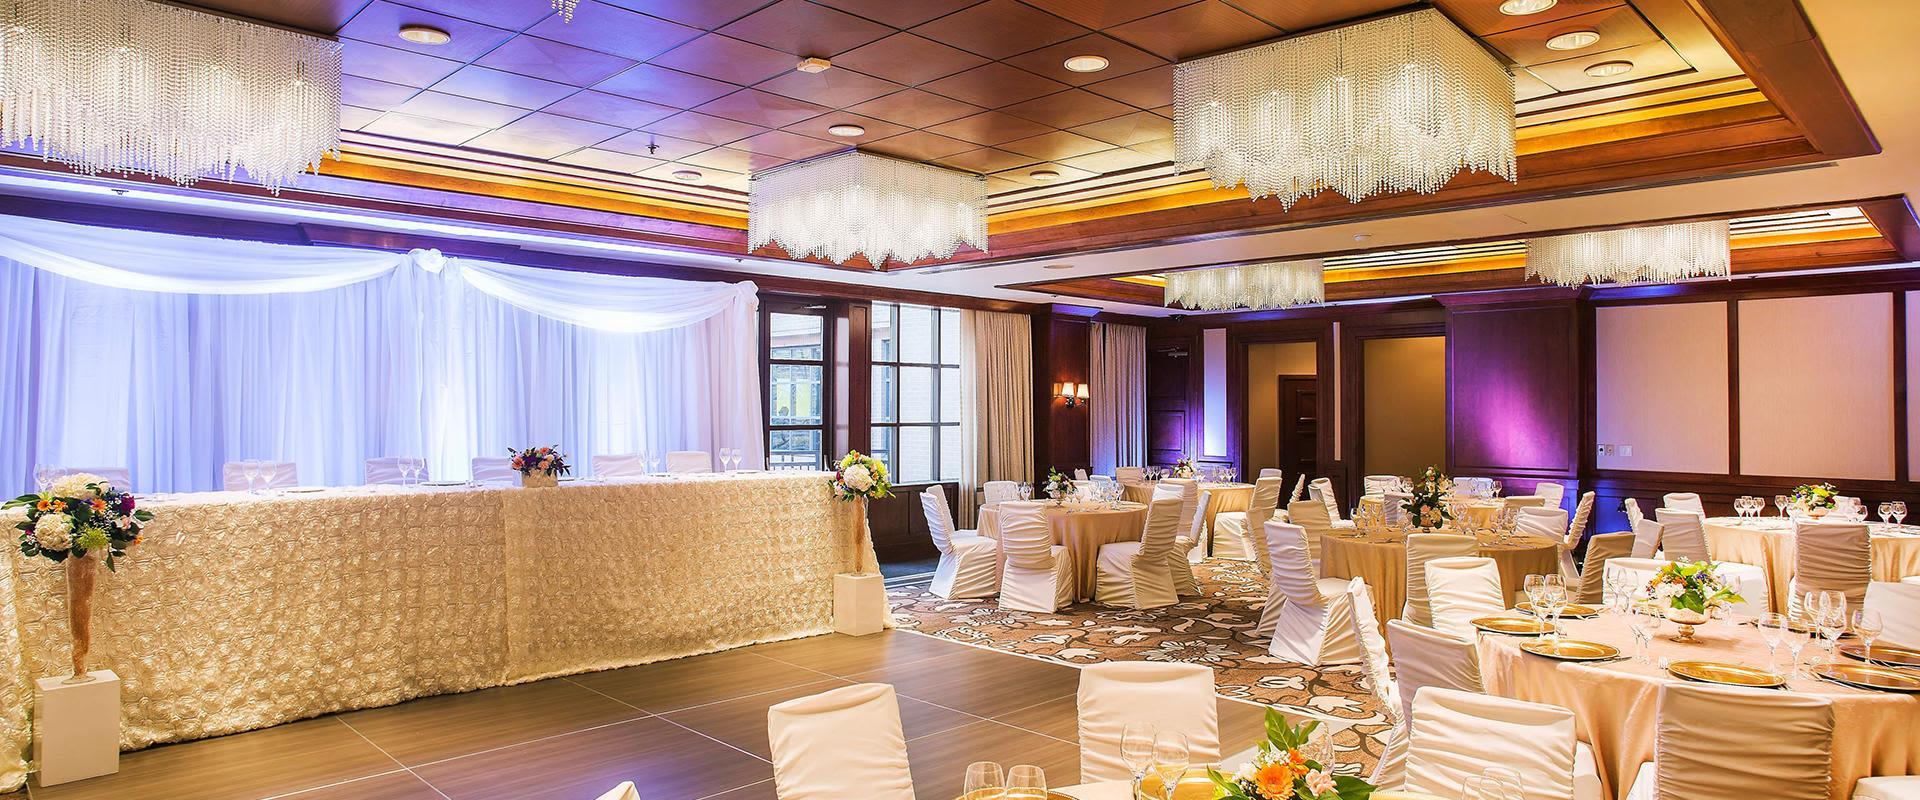 Yorkville Toronto Ballroom with Wedding Setting